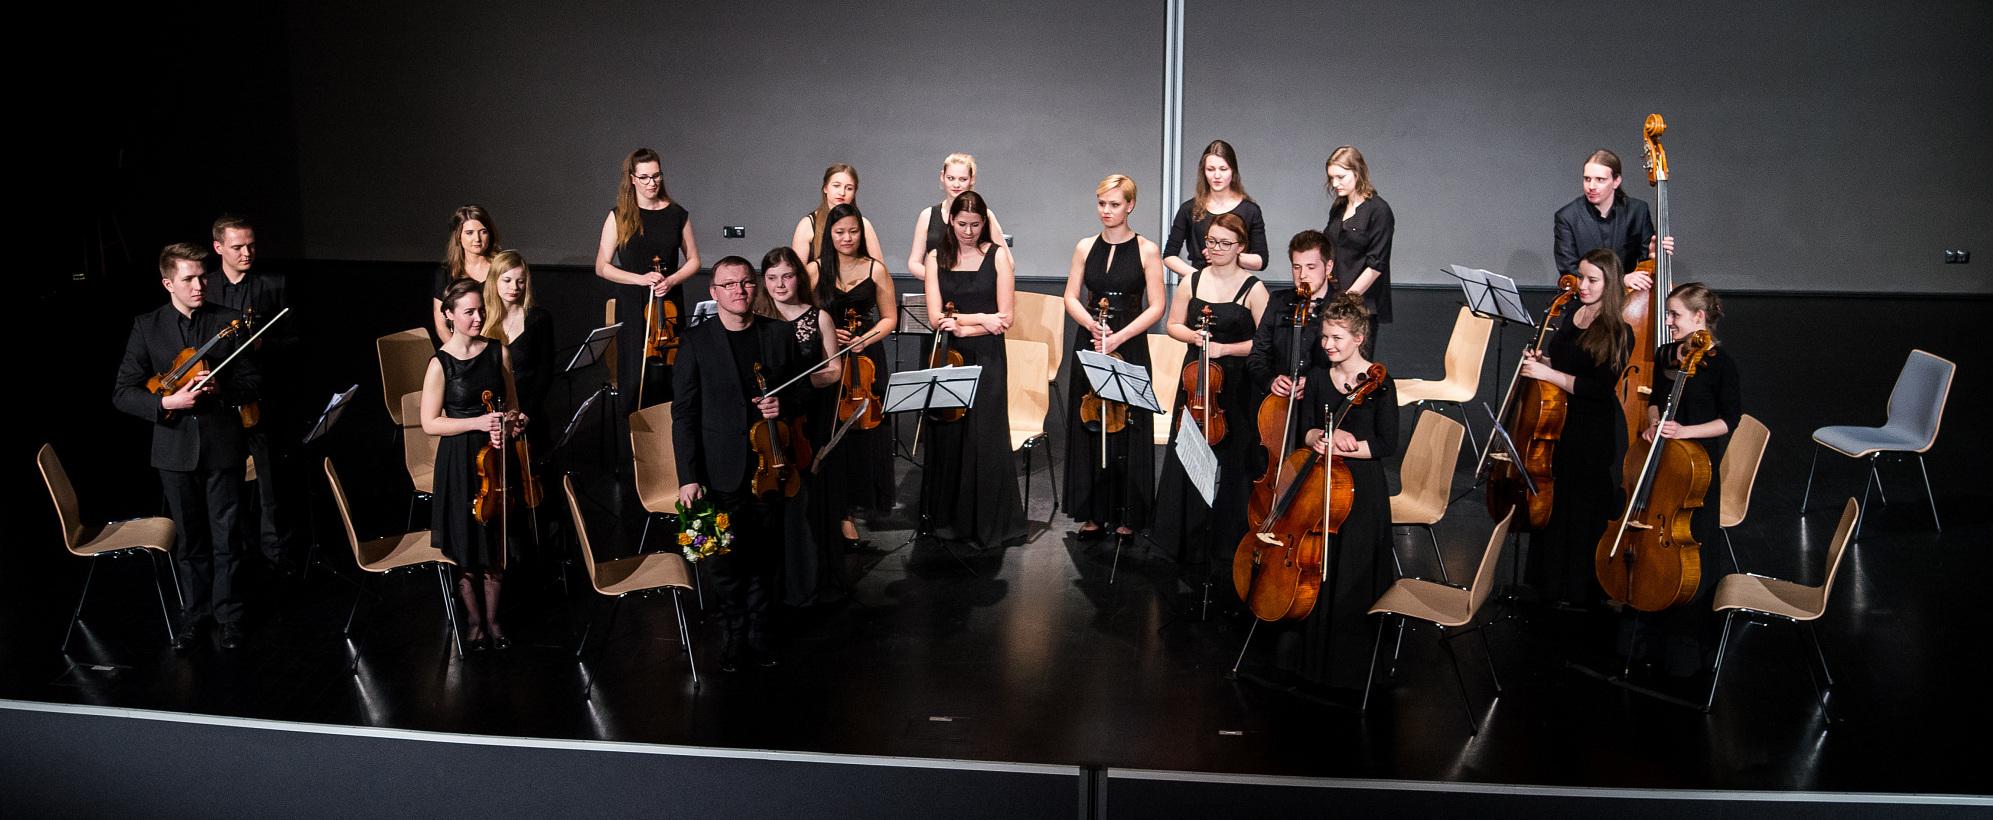 orkiestra-kameralna-am